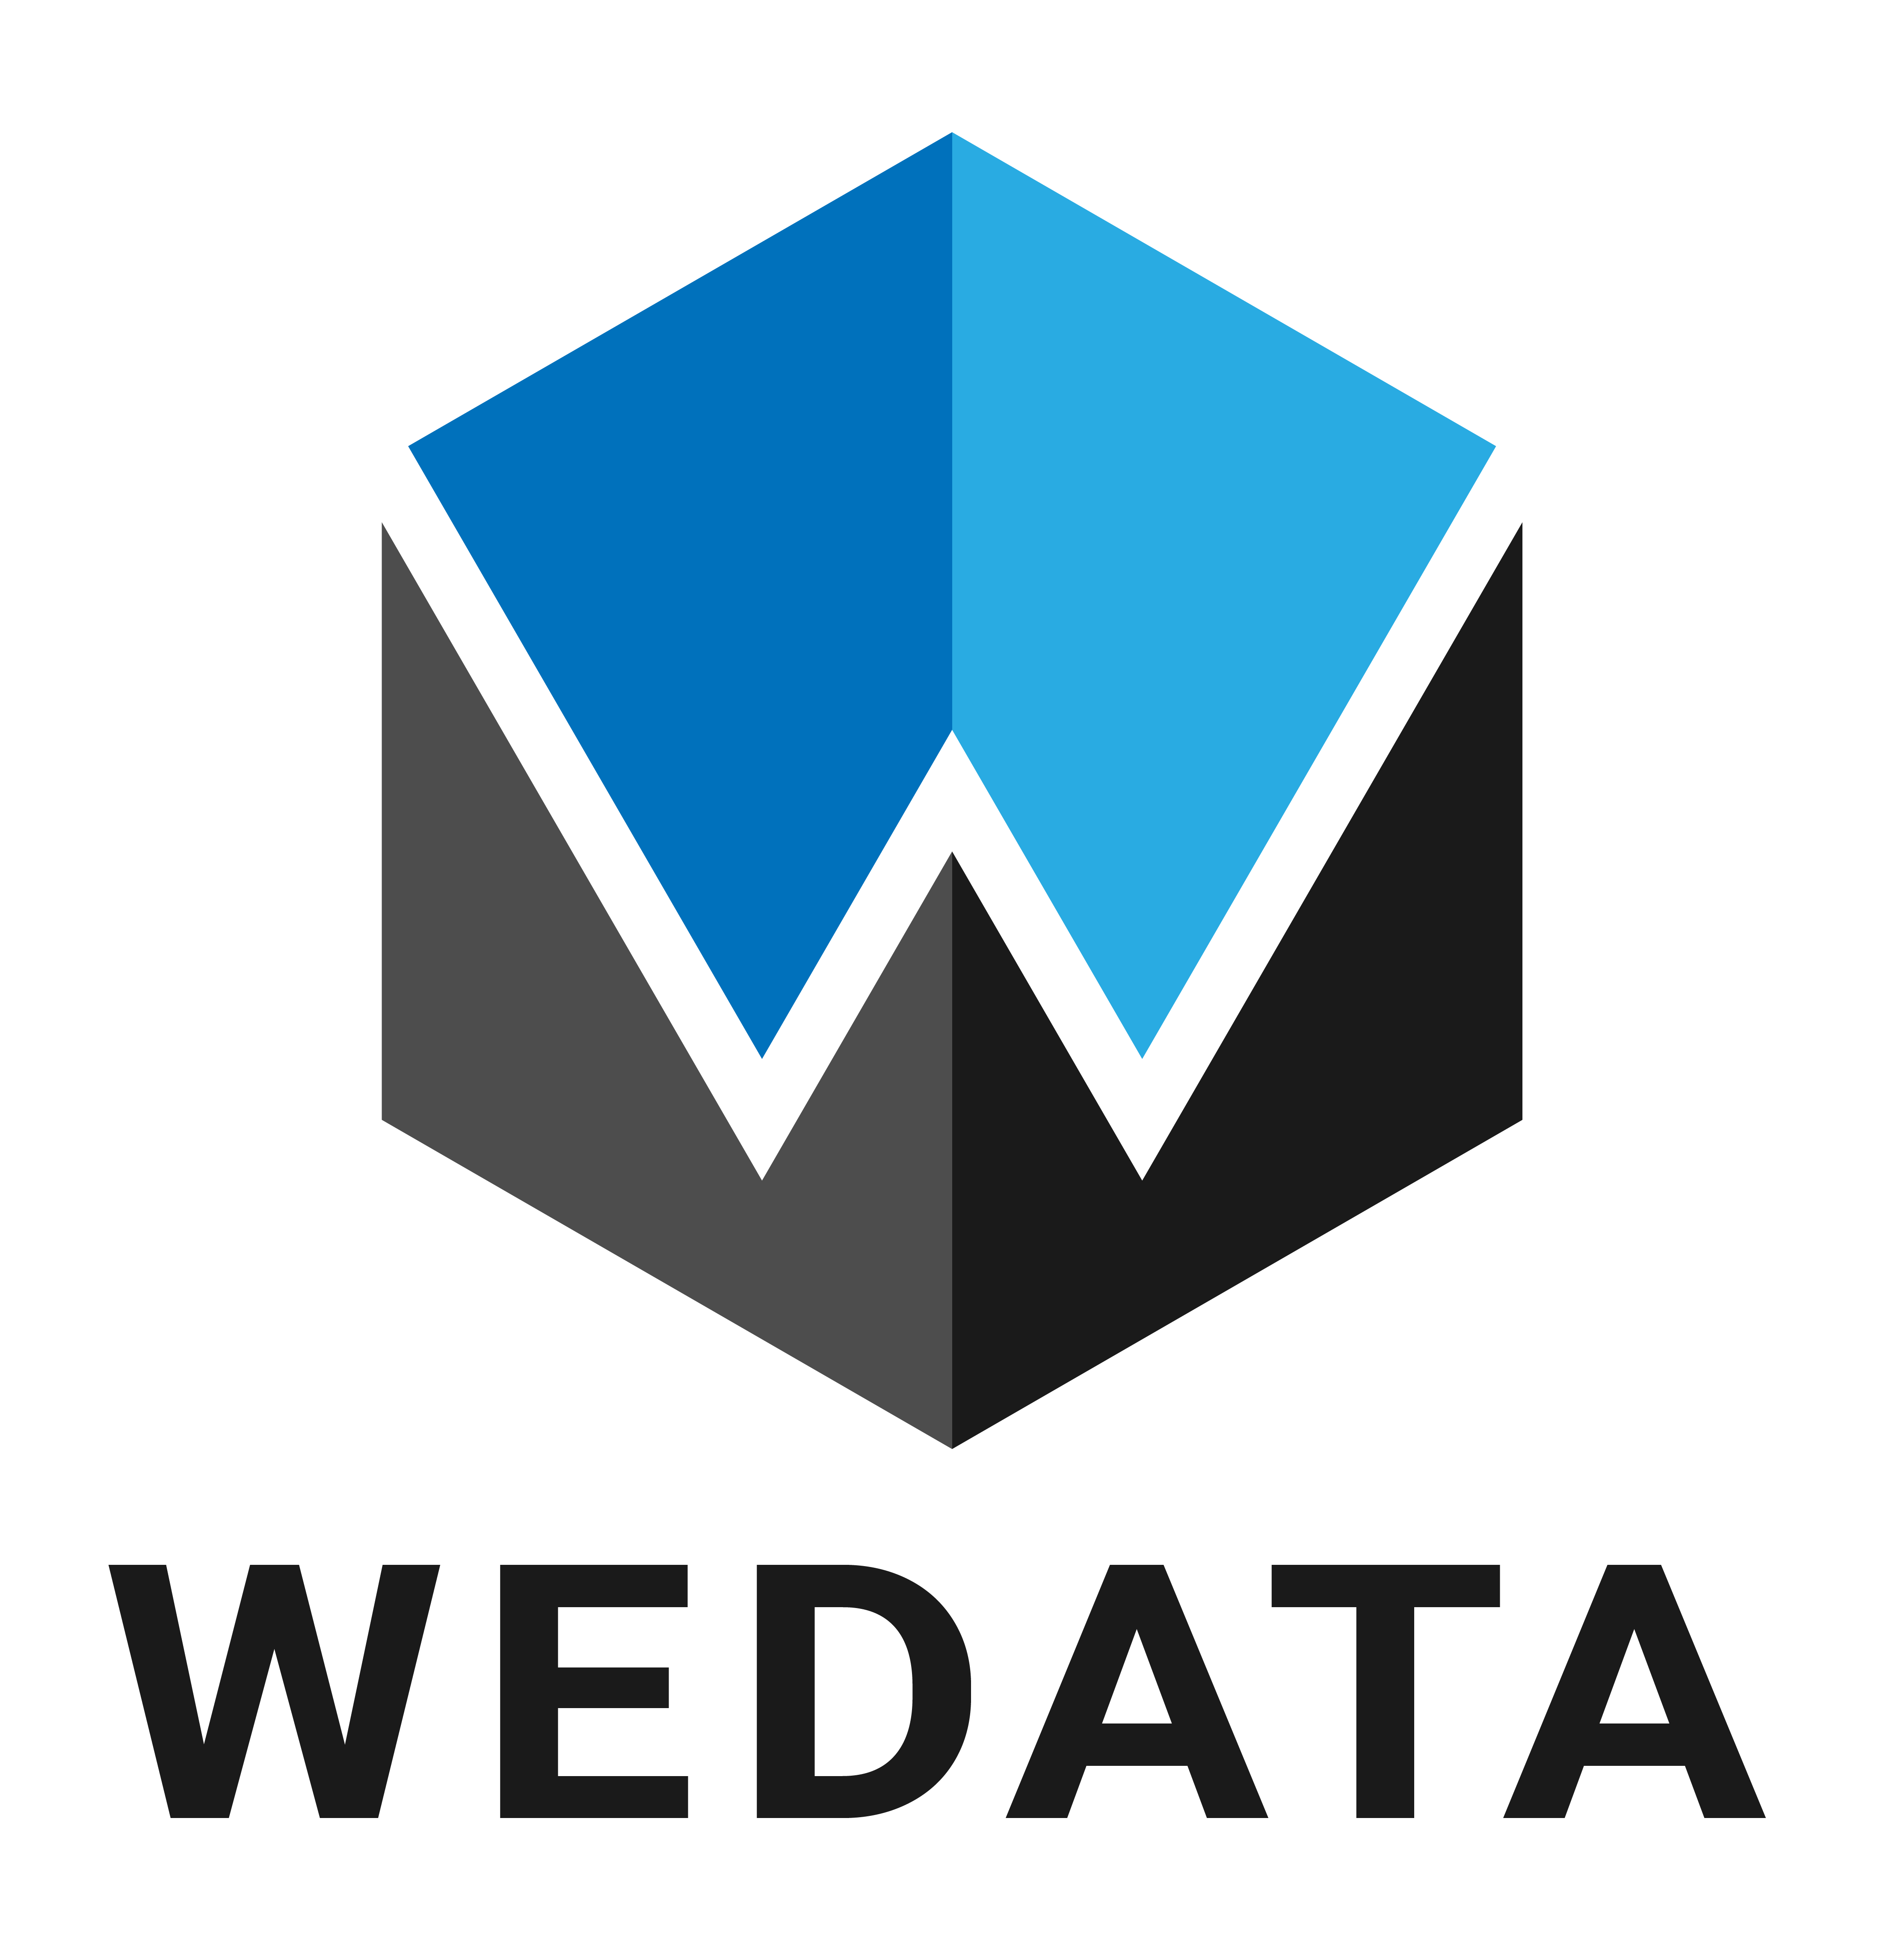 WeData